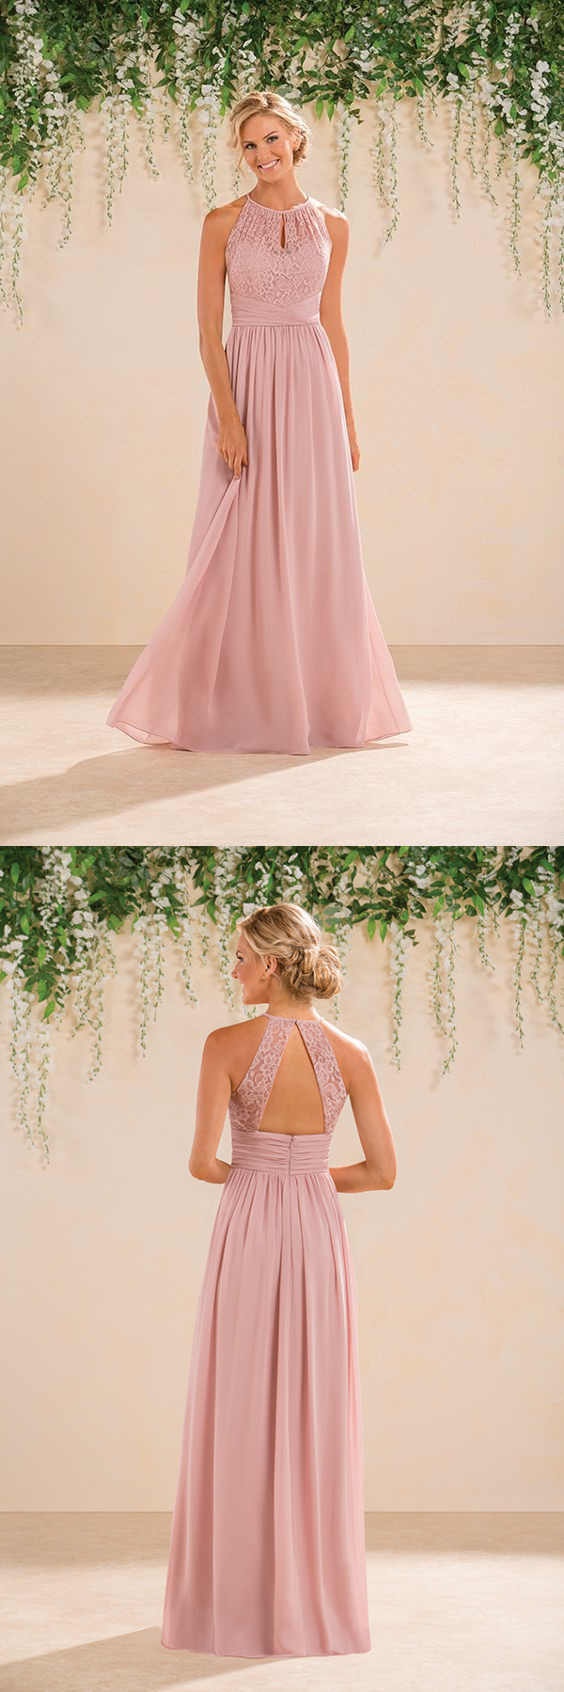 new york good texture classic styles Blush Pink Chiffon Bridesmaid Dress, Round Neck Long Bridesmaid Dress 0317